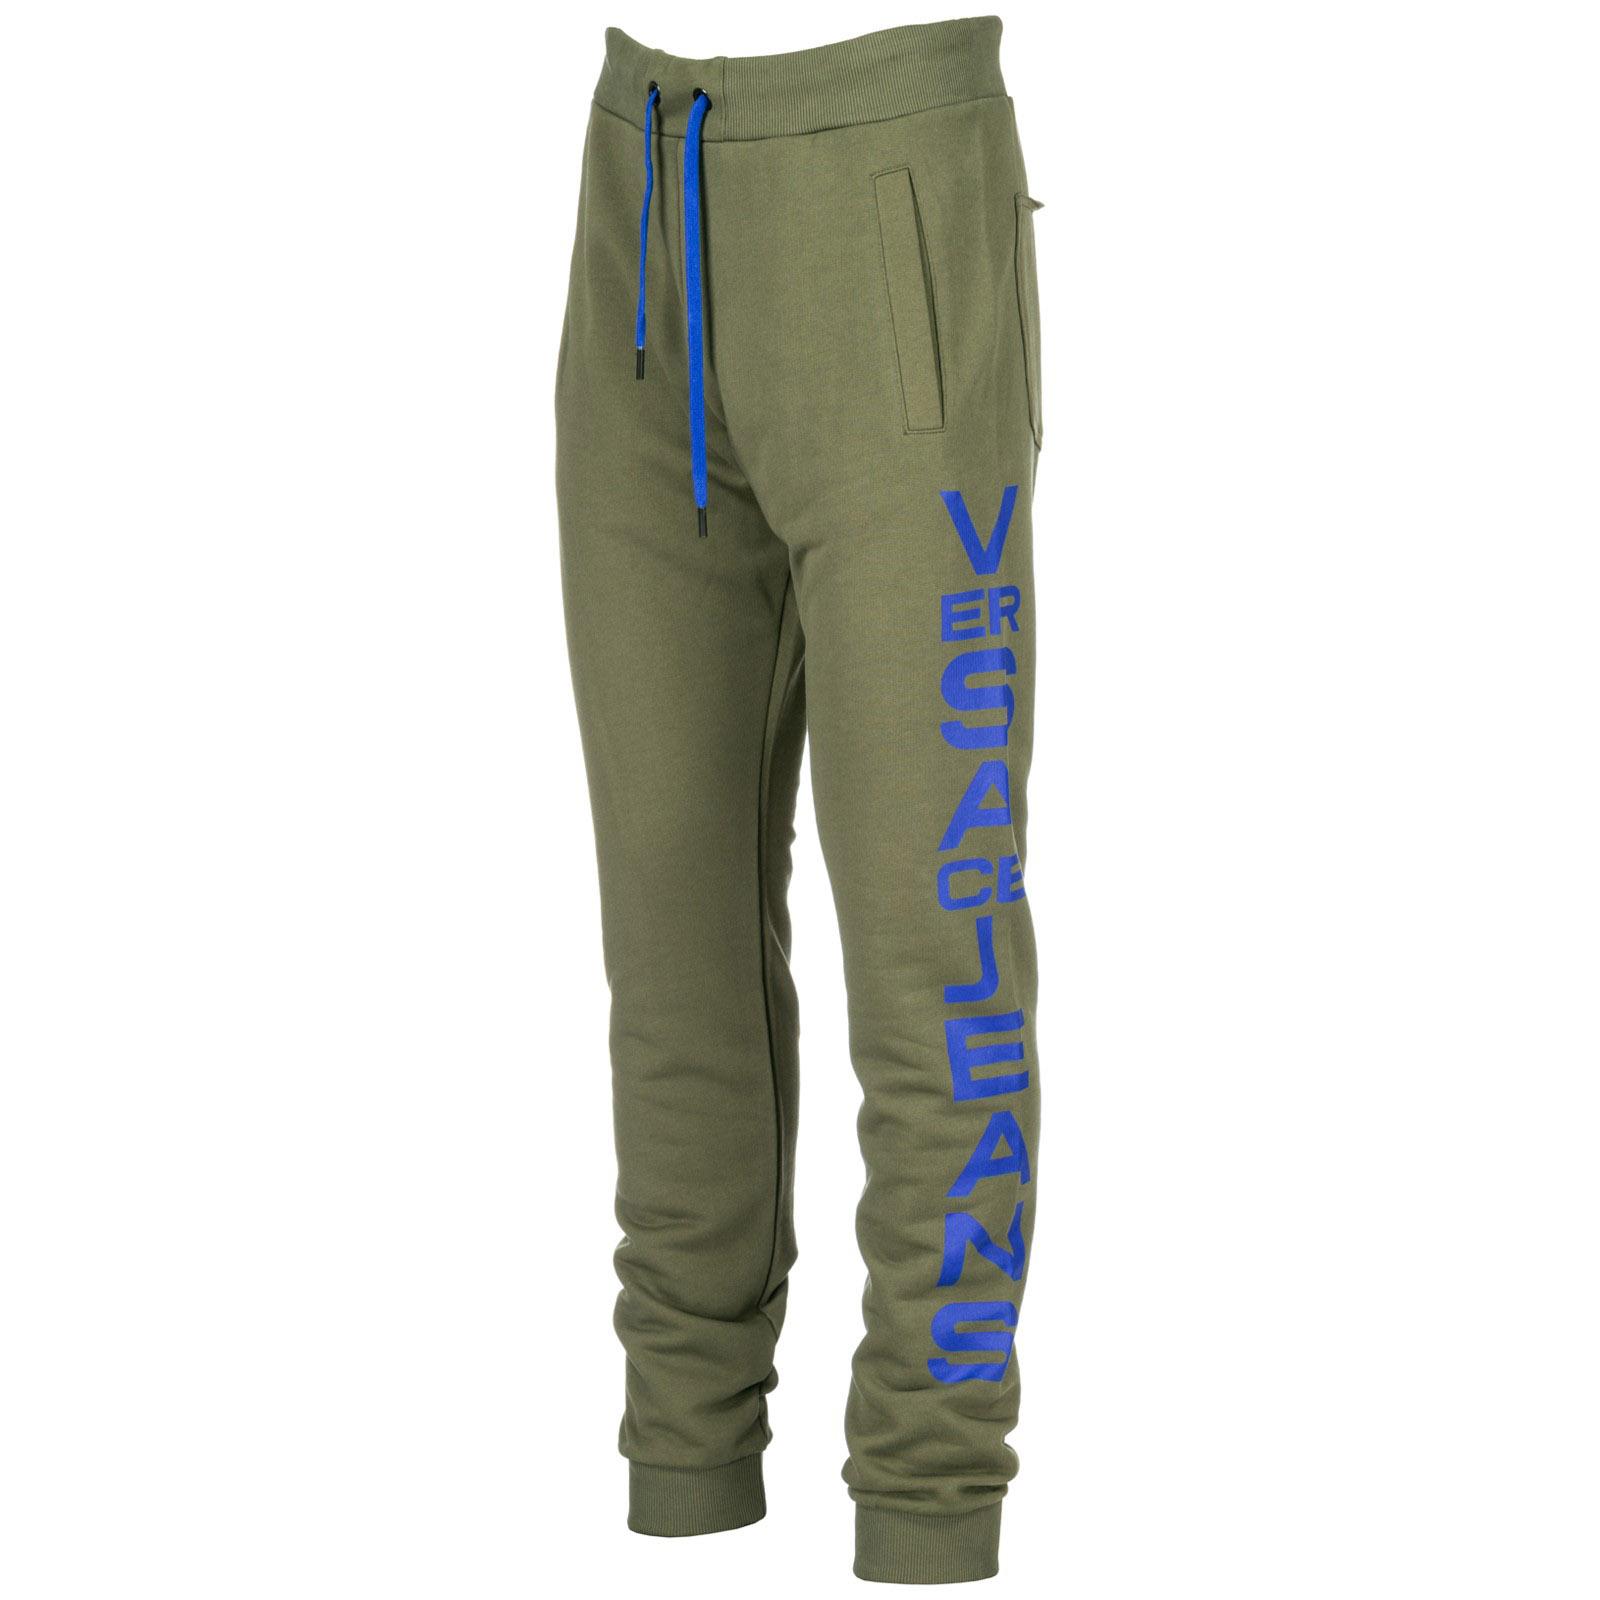 Pantalones deportivos hombre slim fit Pantalones deportivos hombre slim fit  ... 5c6ea424dc9e